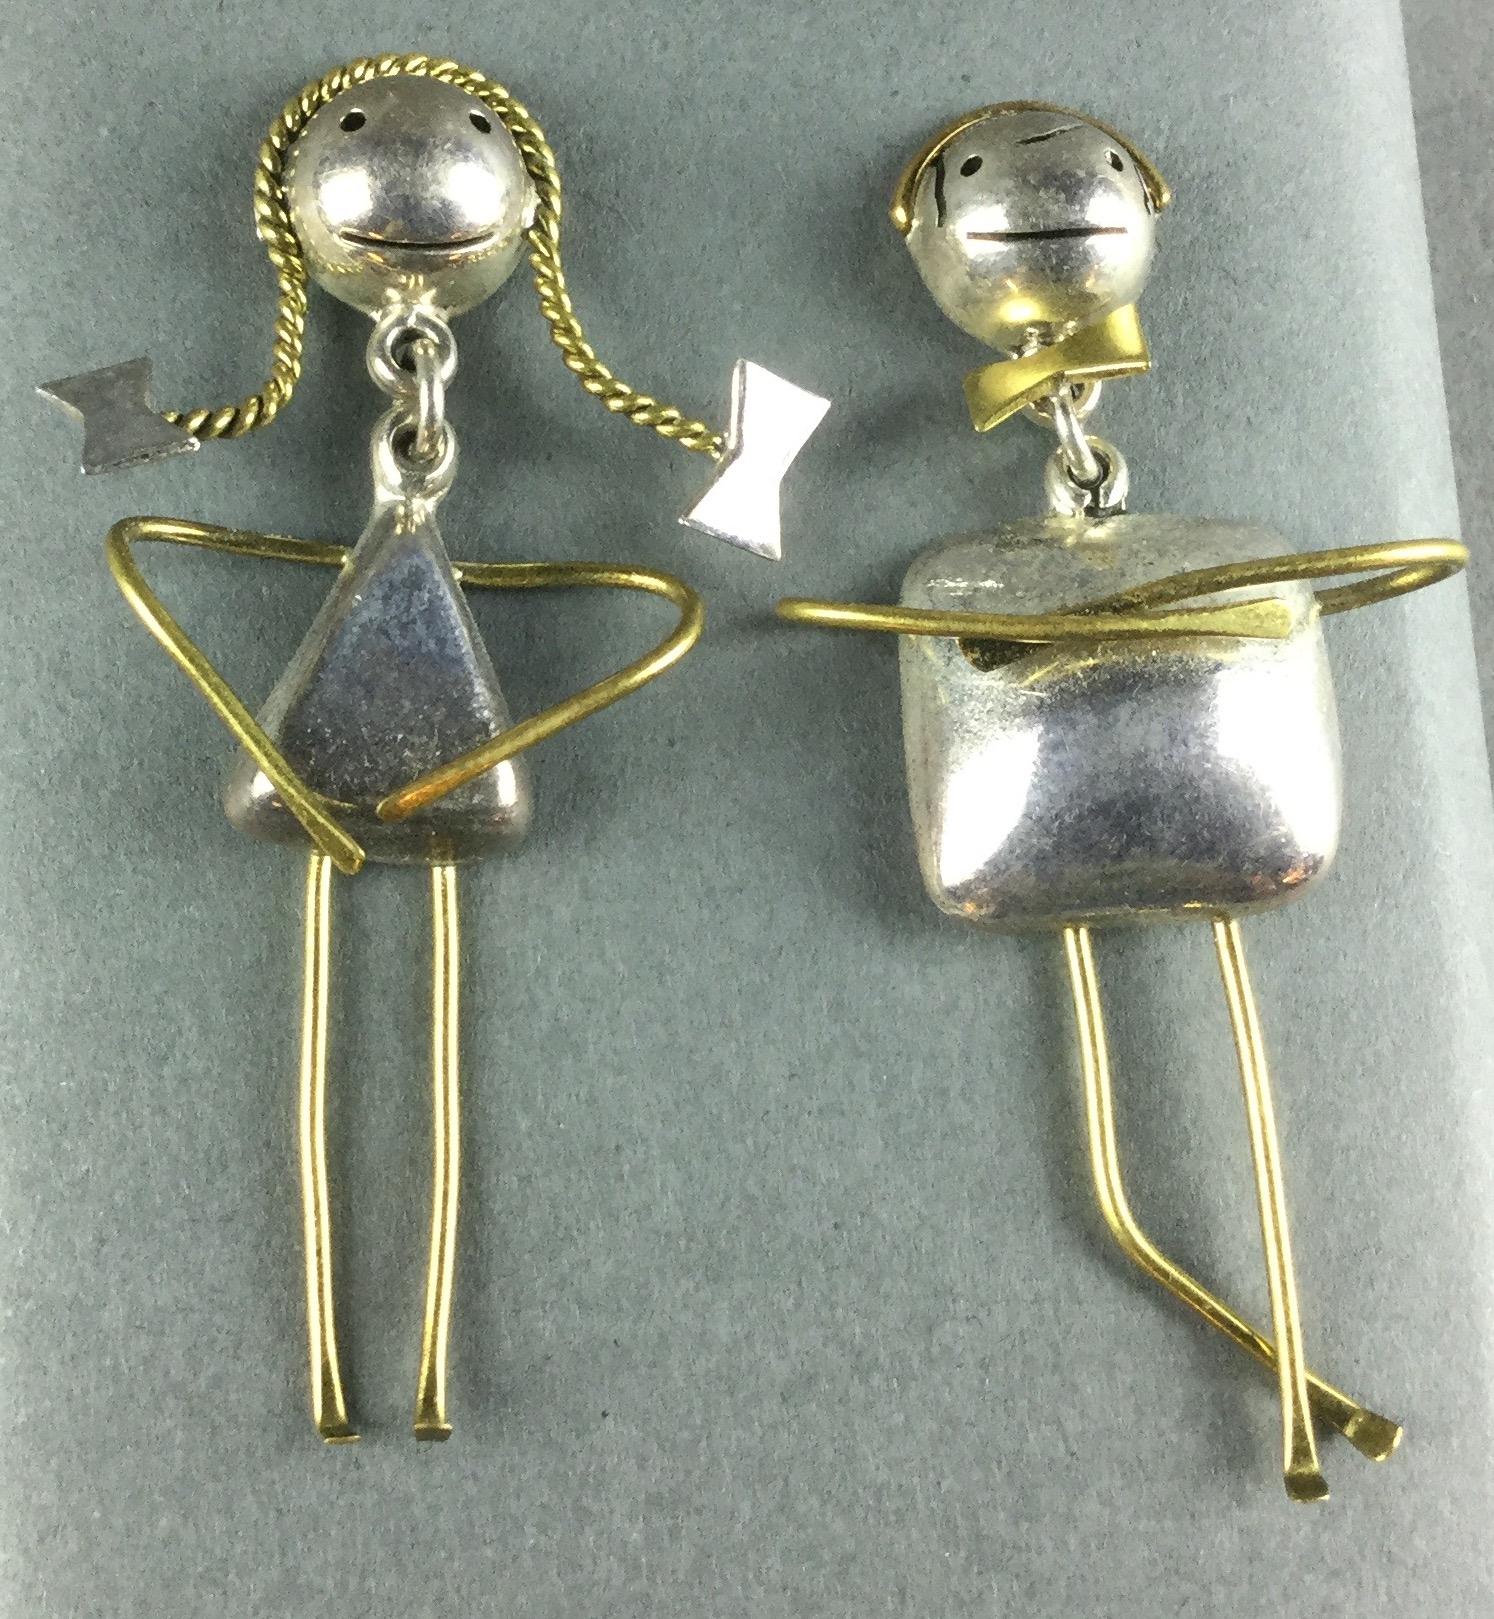 Jewelry_49619A.jpg